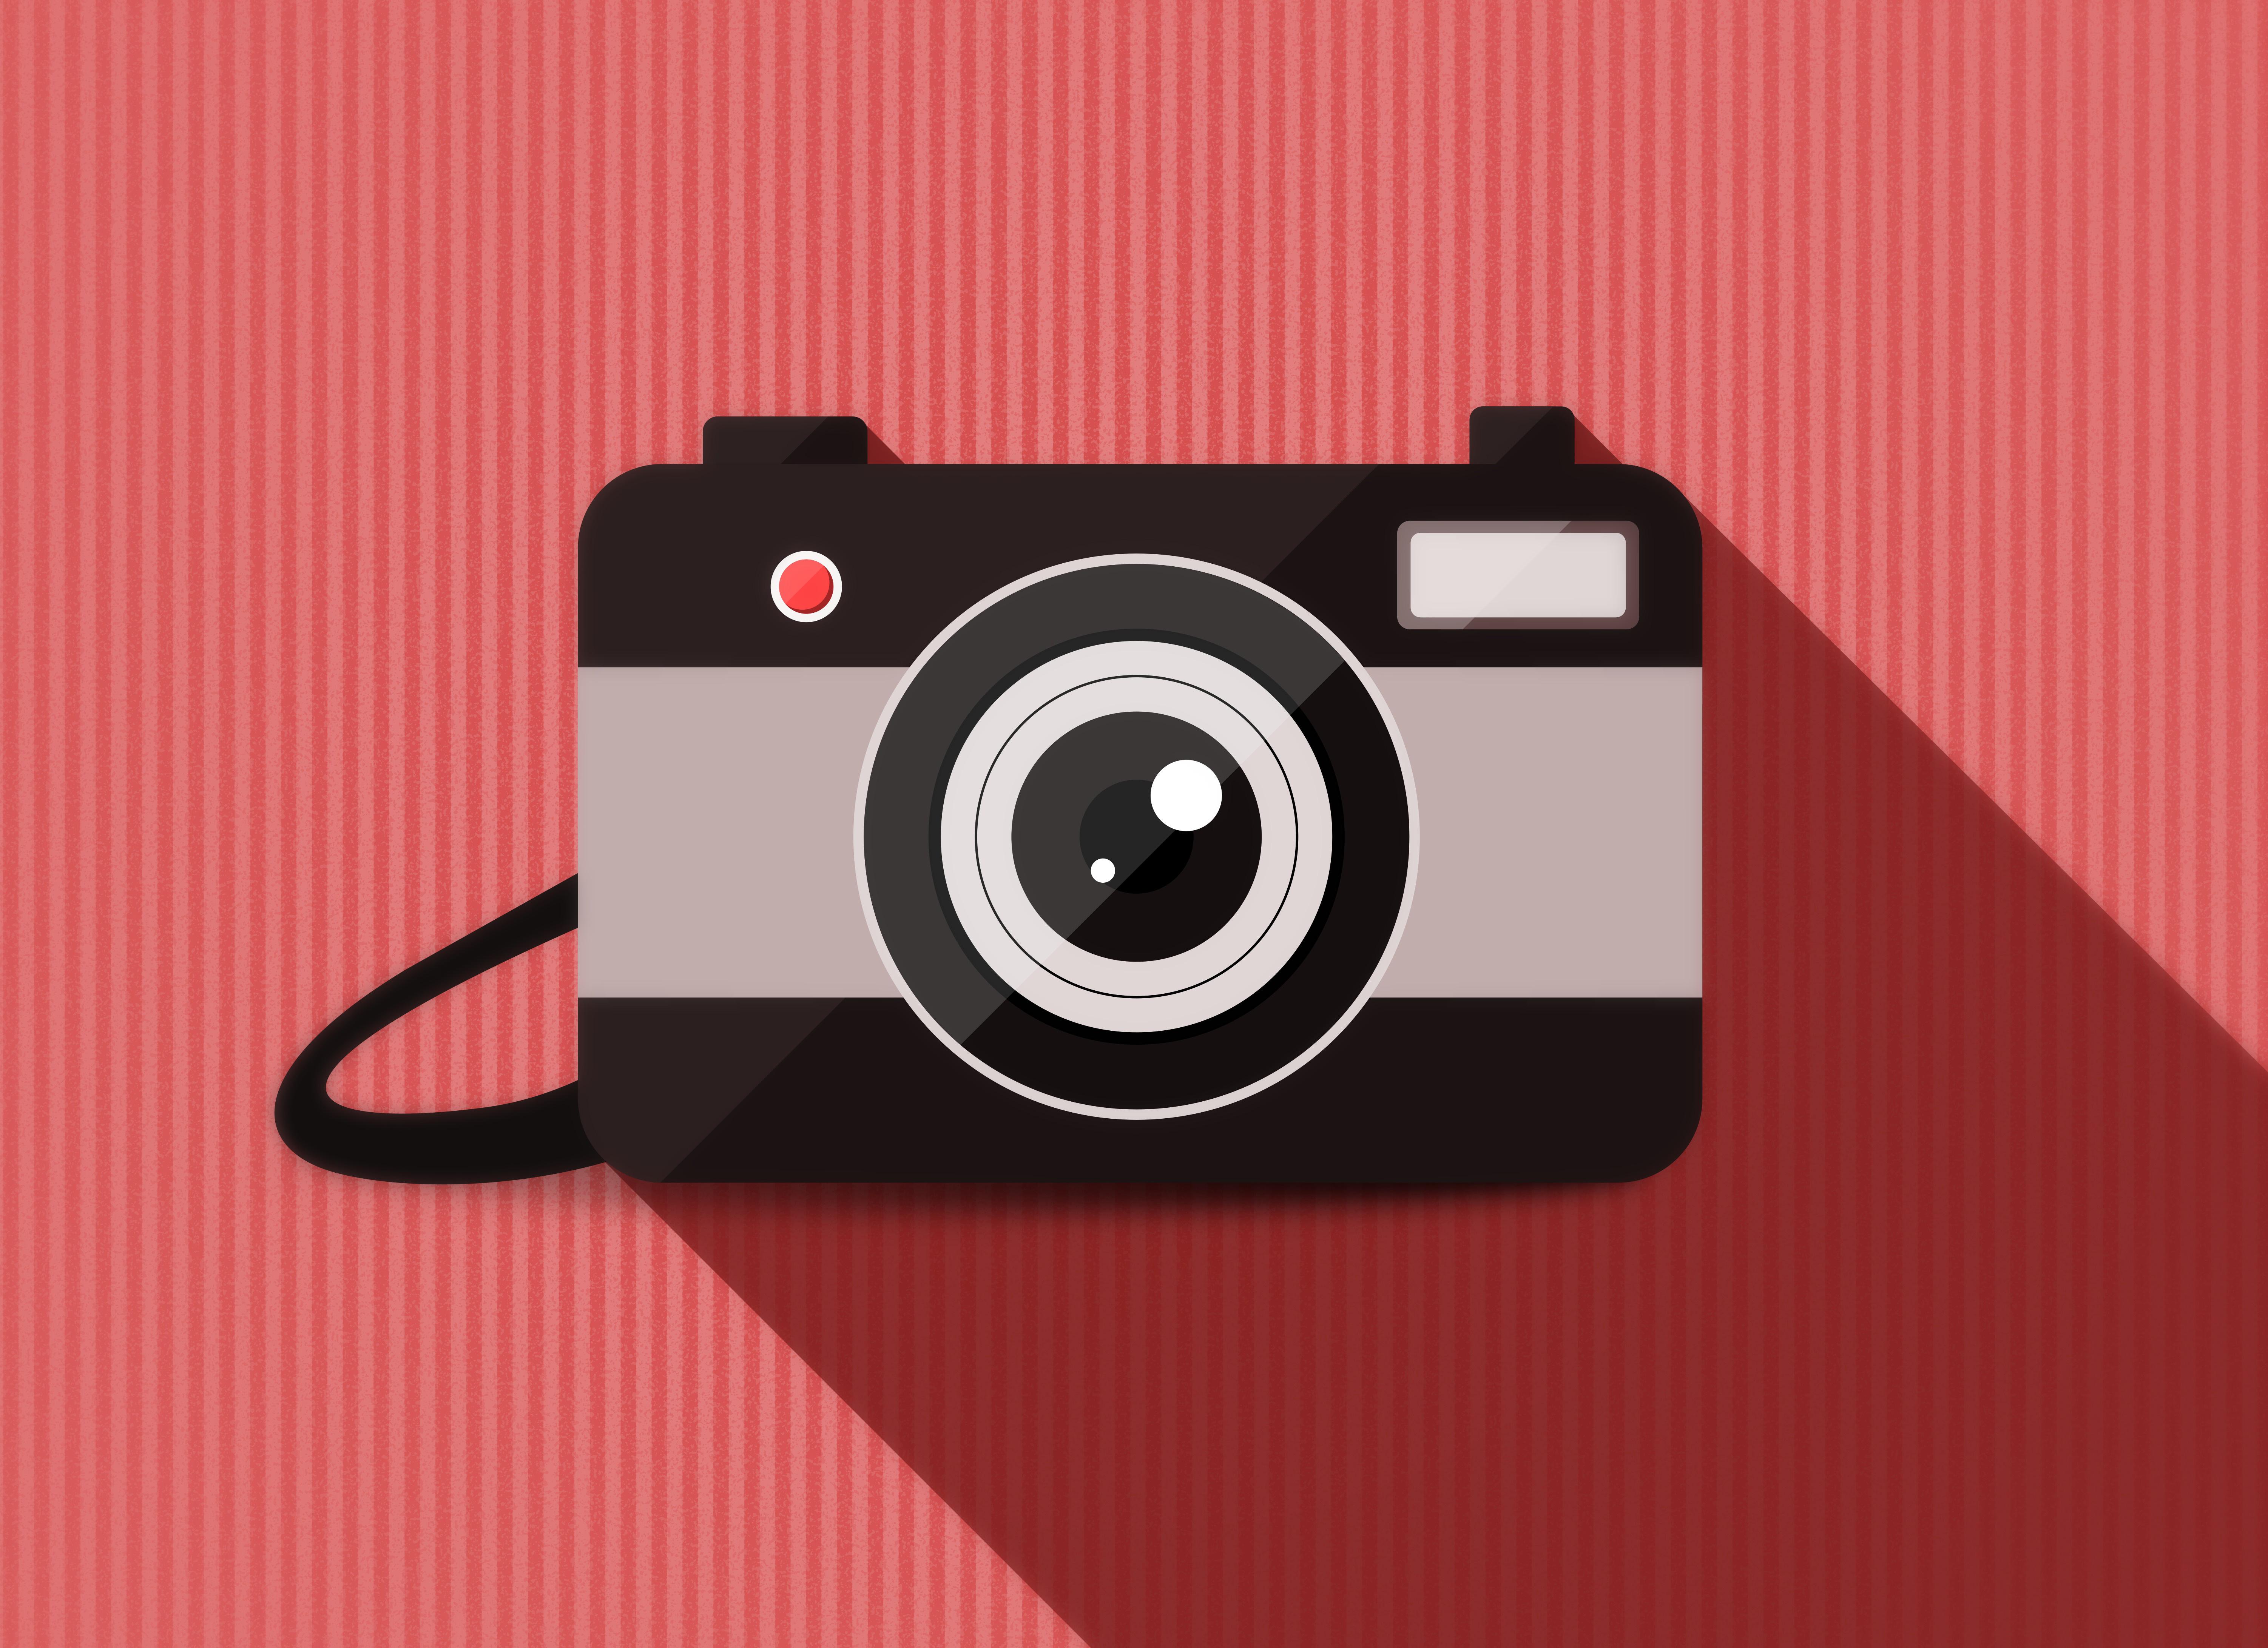 Iphone 6s Plus 4k Wallpaper: 1080x1920 Camera Vector Minimalism 4k 5k Iphone 7,6s,6